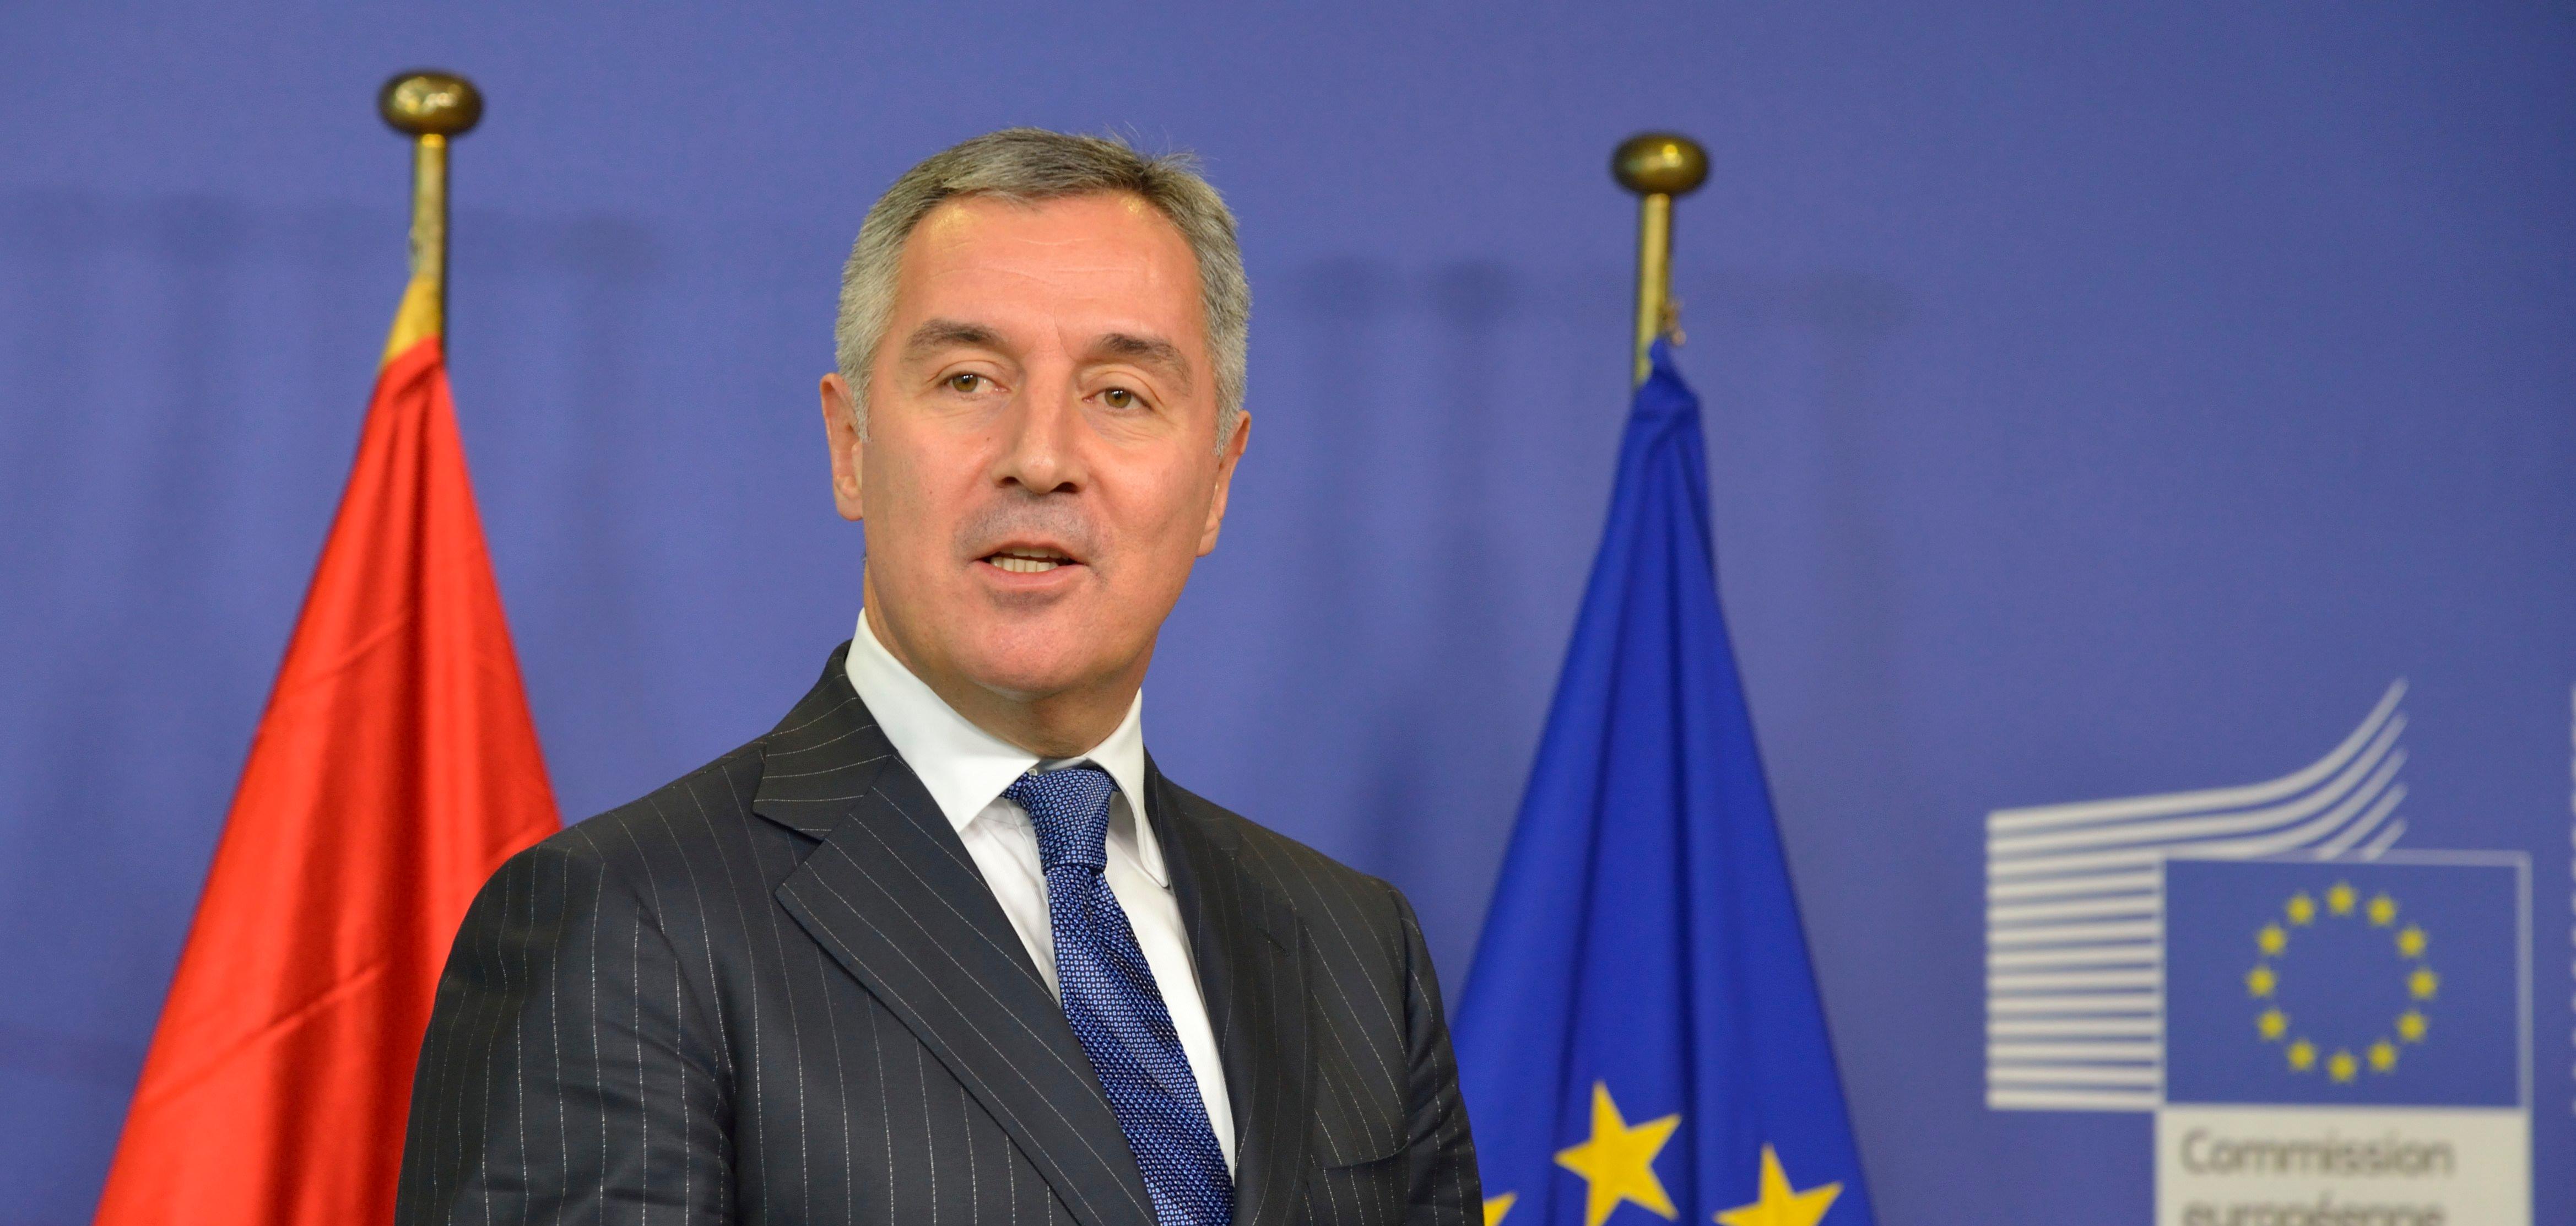 Đukanović se nada proširenju EU